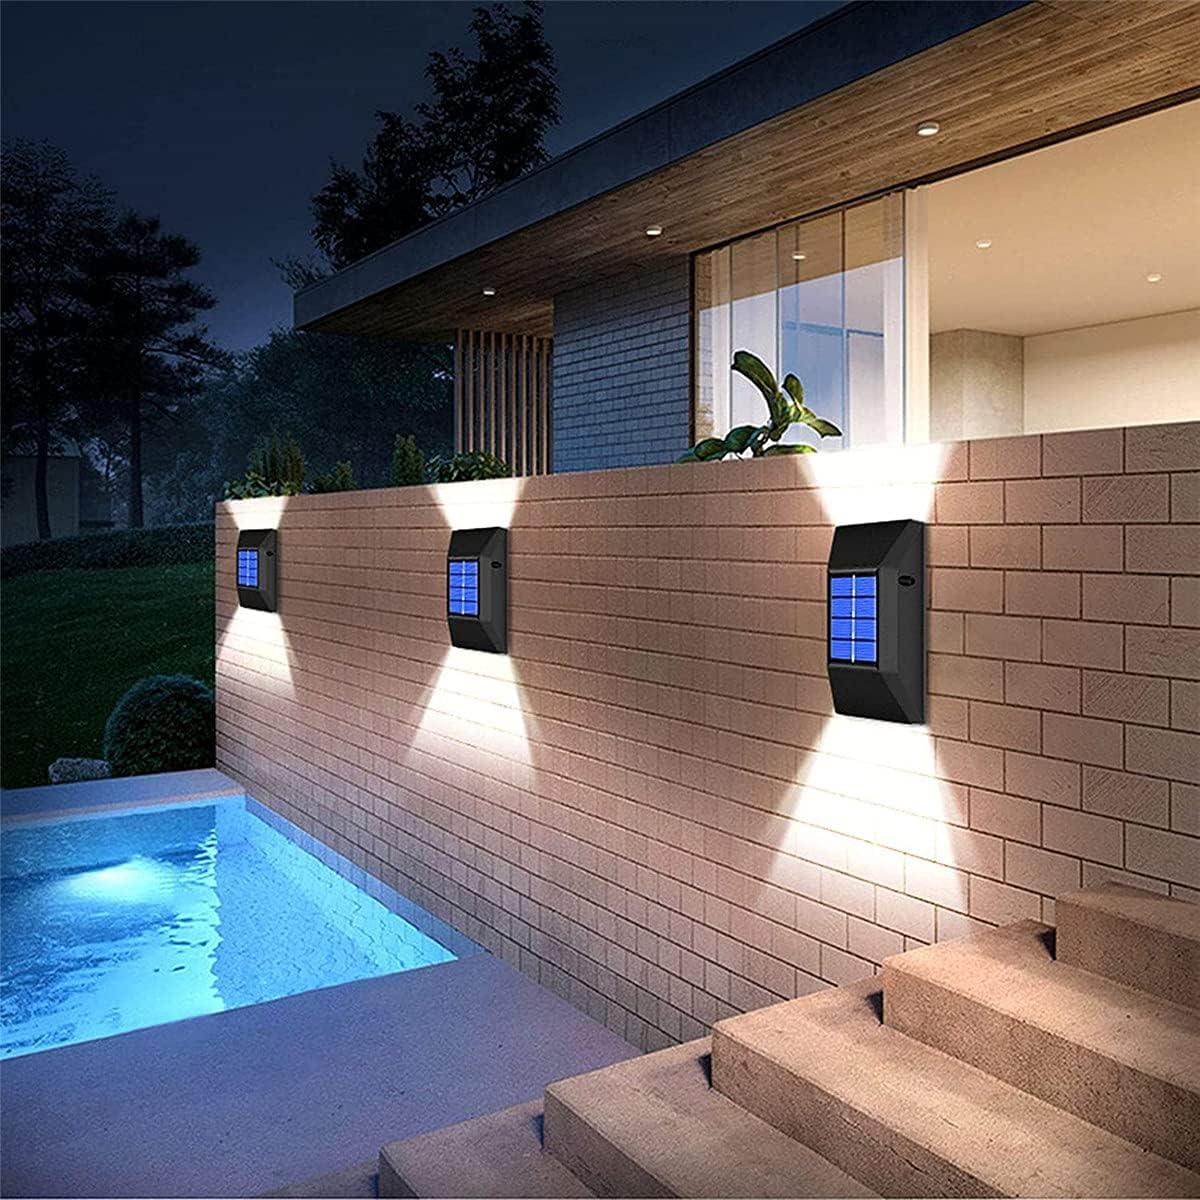 Solar Lights Outdoor, 2 Pack 6 Led Light Outdoor Garden Decorative Motion Sensor Lights Waterproof Security Wall Lighting Outside for Front Door, Backyard (White Light-2 Pack)